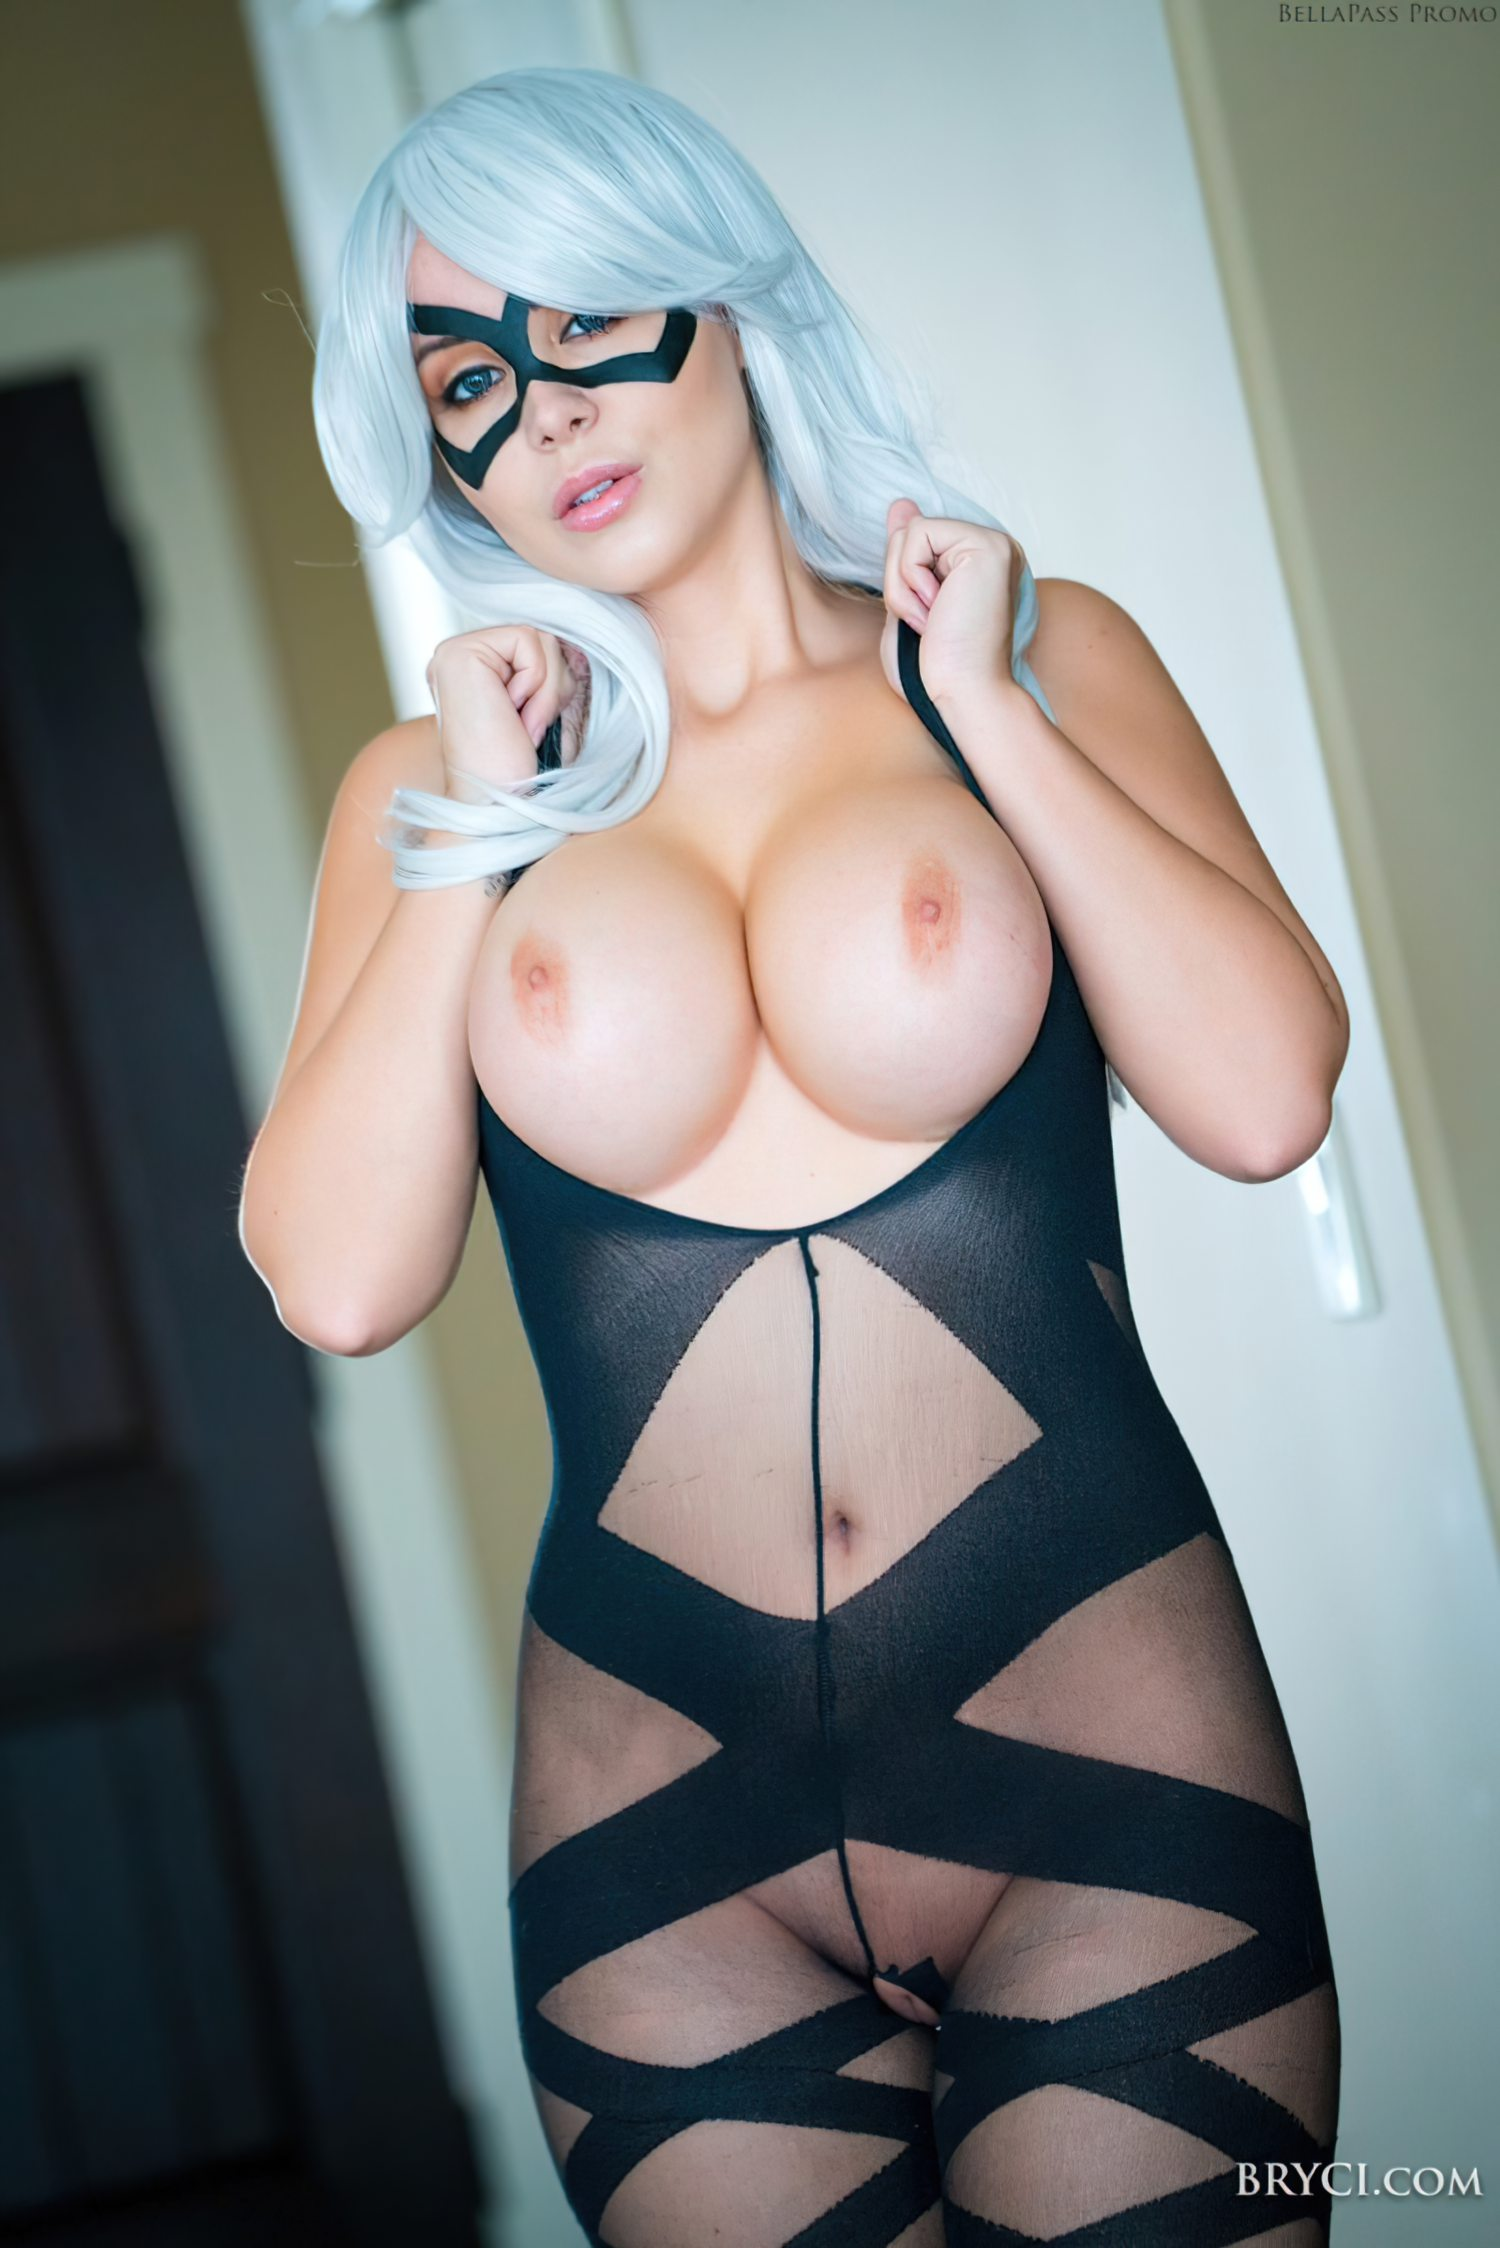 Bryci Catwoman Nua (6)